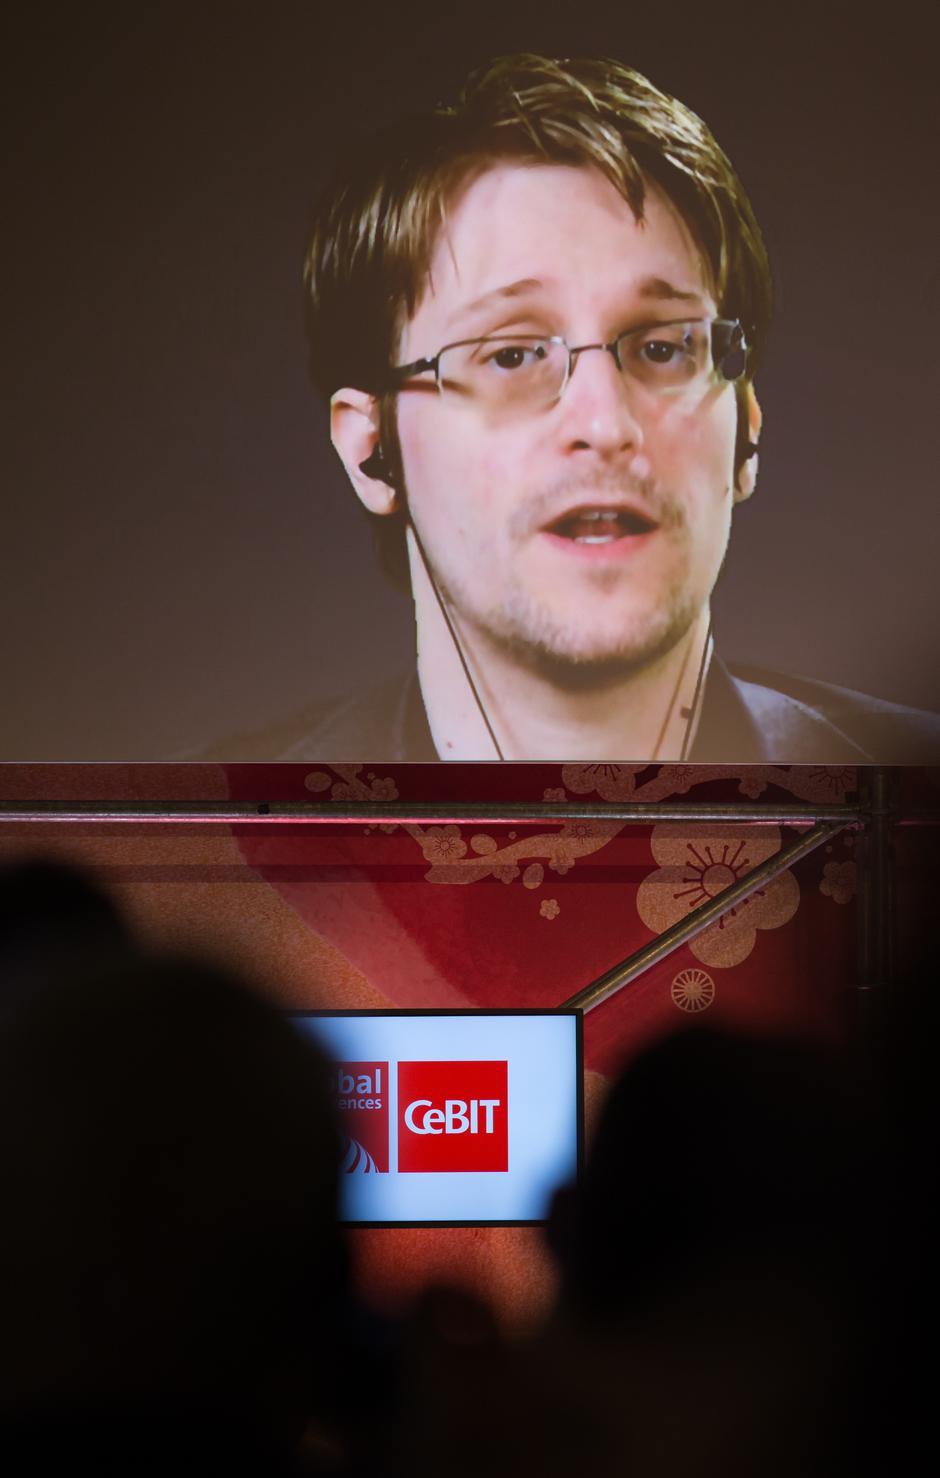 Edward Snowden | Author: Friso Gentsch/DPA/PIXSELL